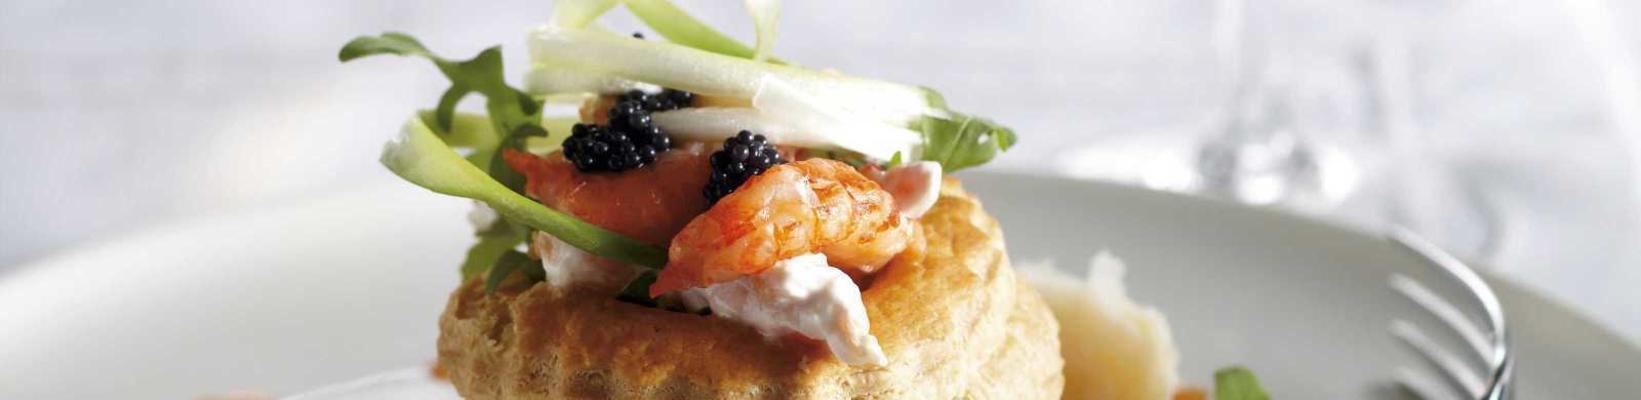 patties with crayfish salad